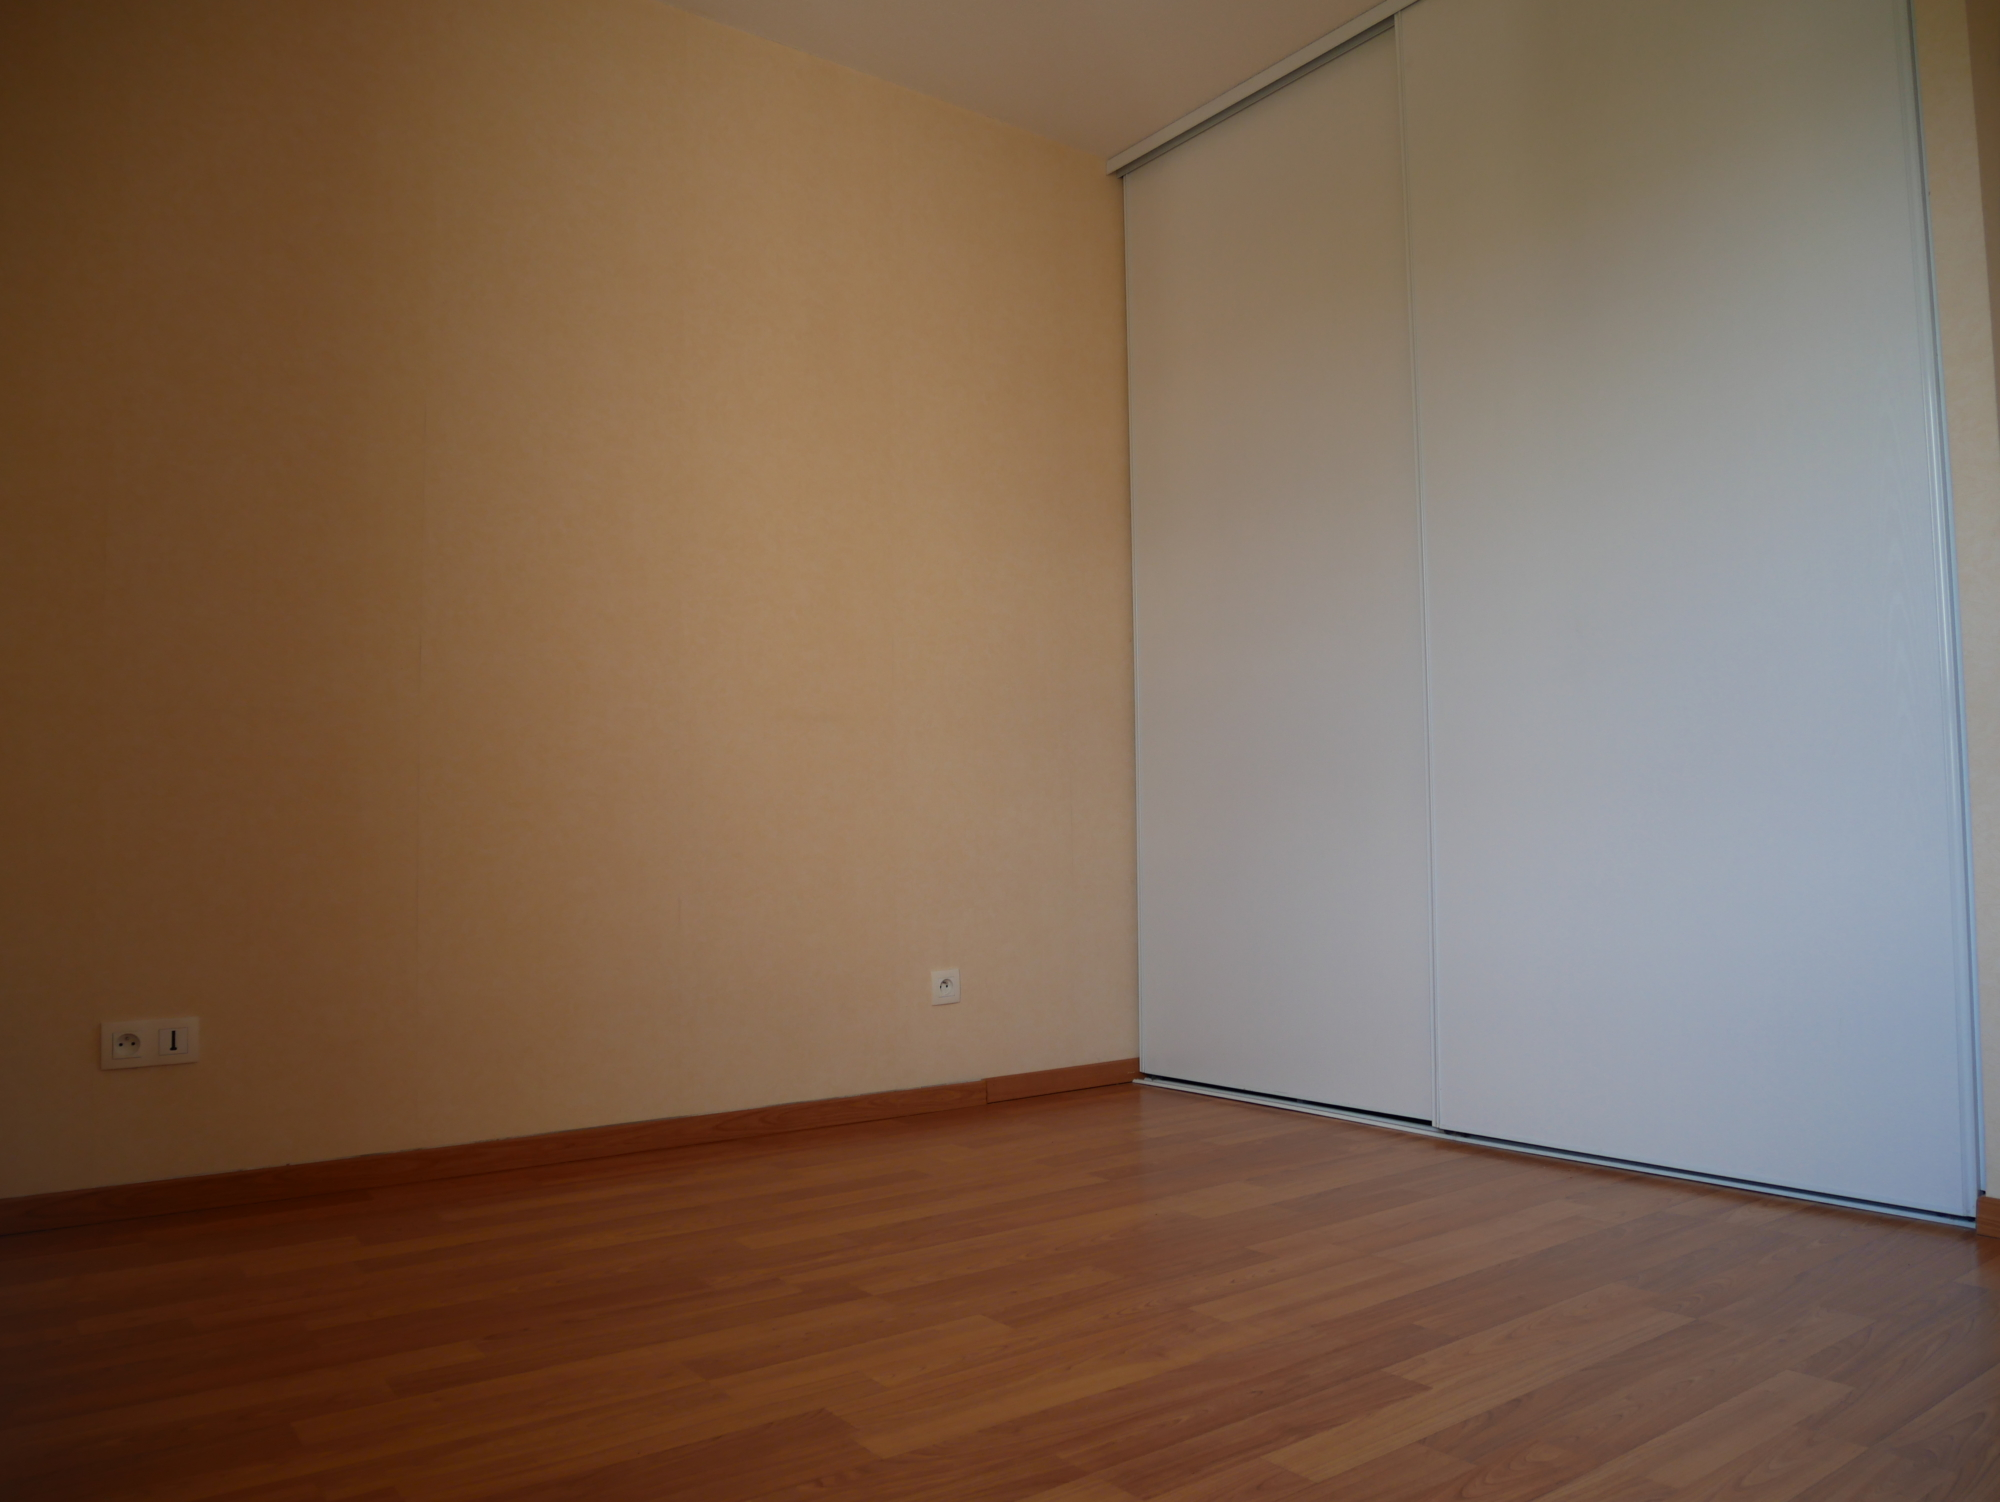 [Fresh] Lumineux 3 pièces avec balcon et parking - Souffelweyersheim - nos ventes - Beausite Immobilier 9